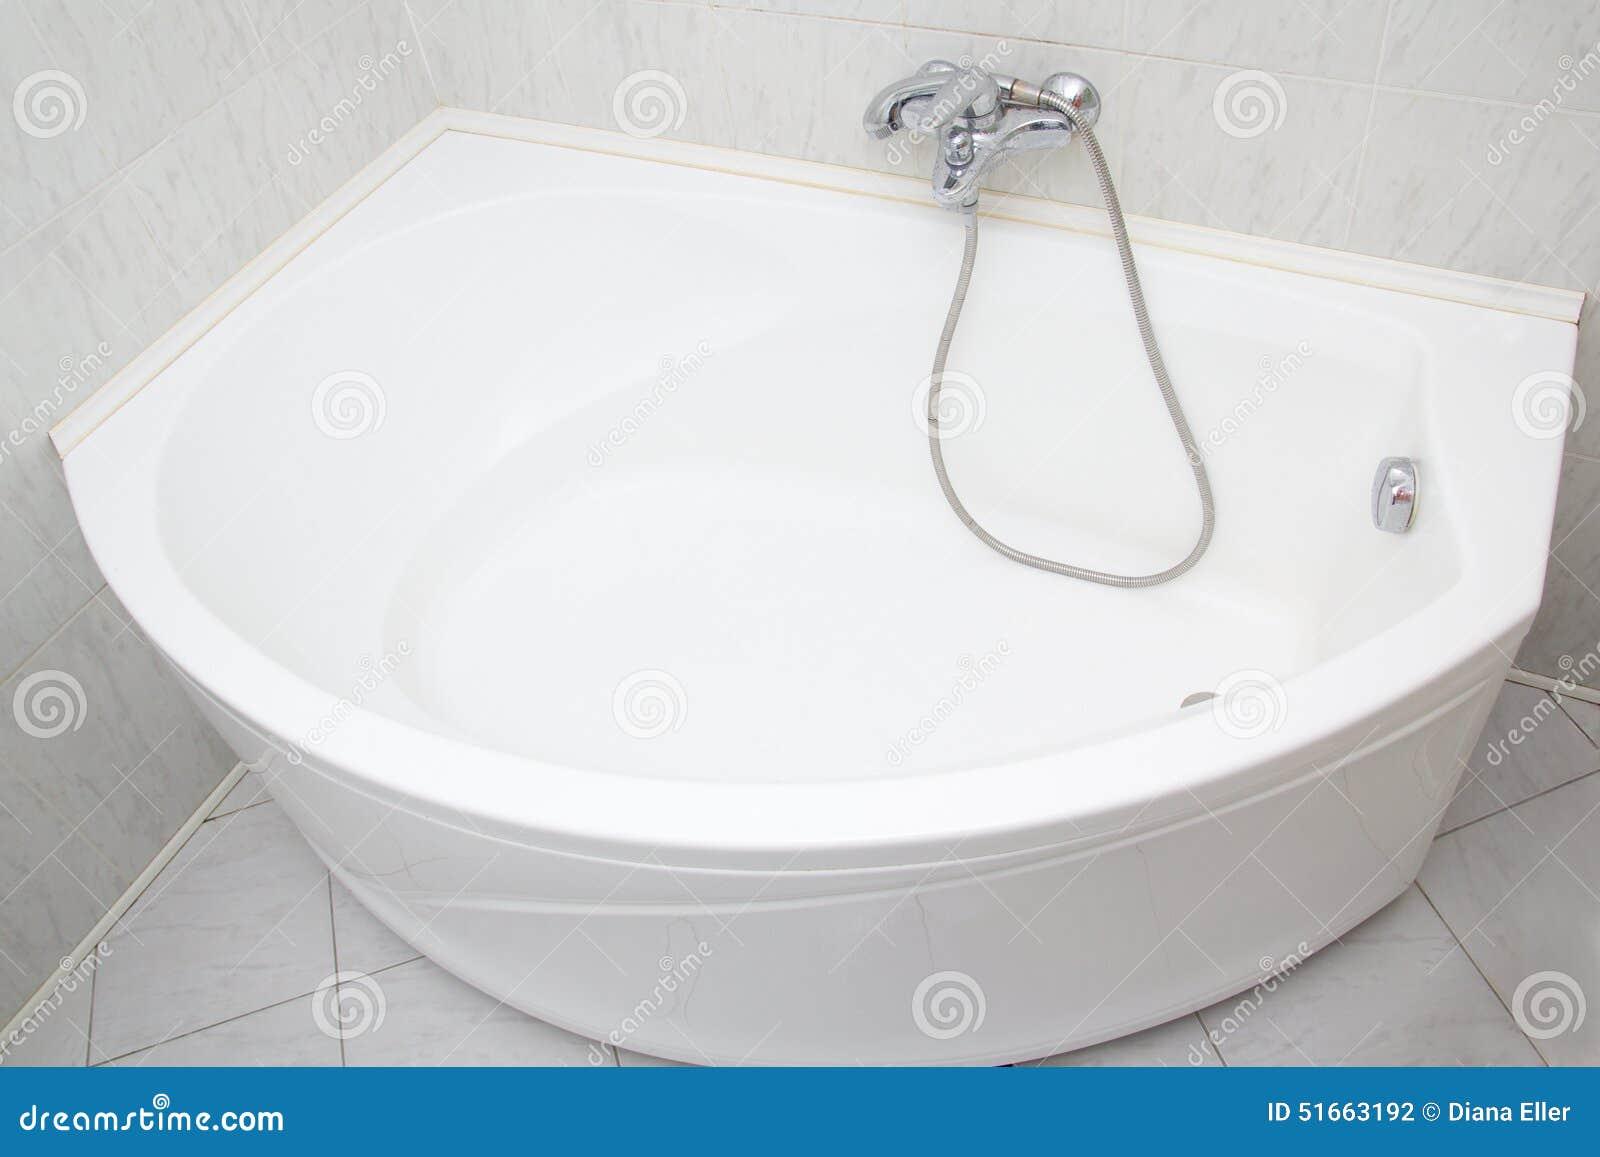 Luxury Bath Tub In White Bathroom Stock Photo - Image of bathtubs ...